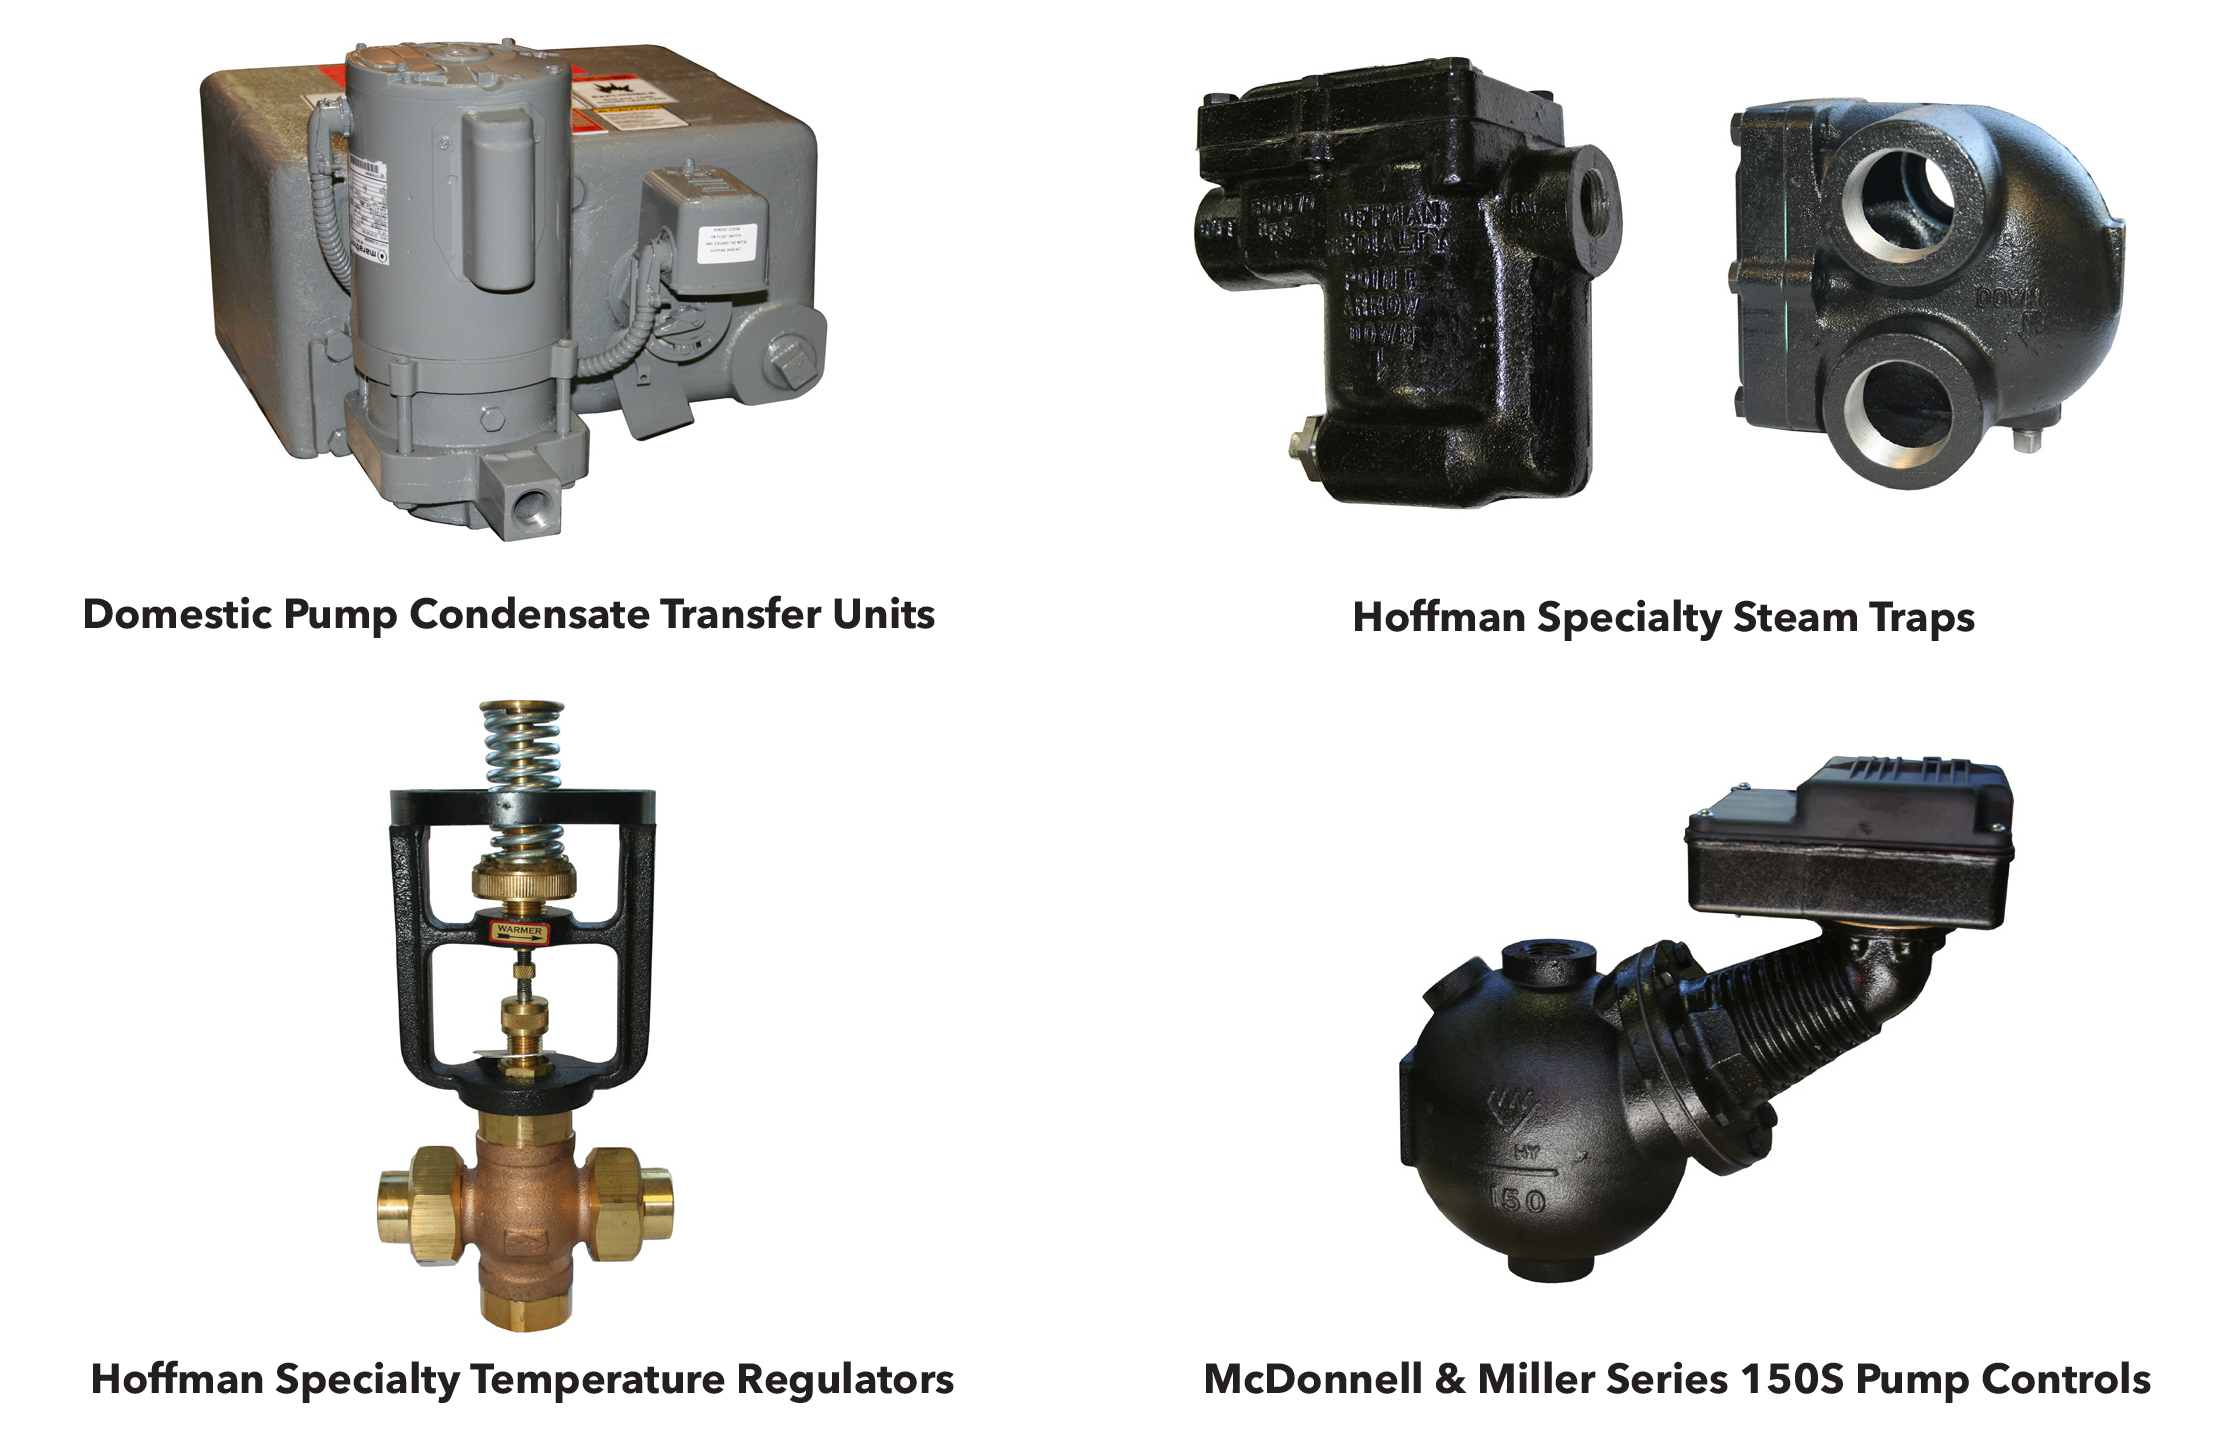 Bell & Gossett Domestic Pump, Hoffman Specialty and McDonnell & Miller